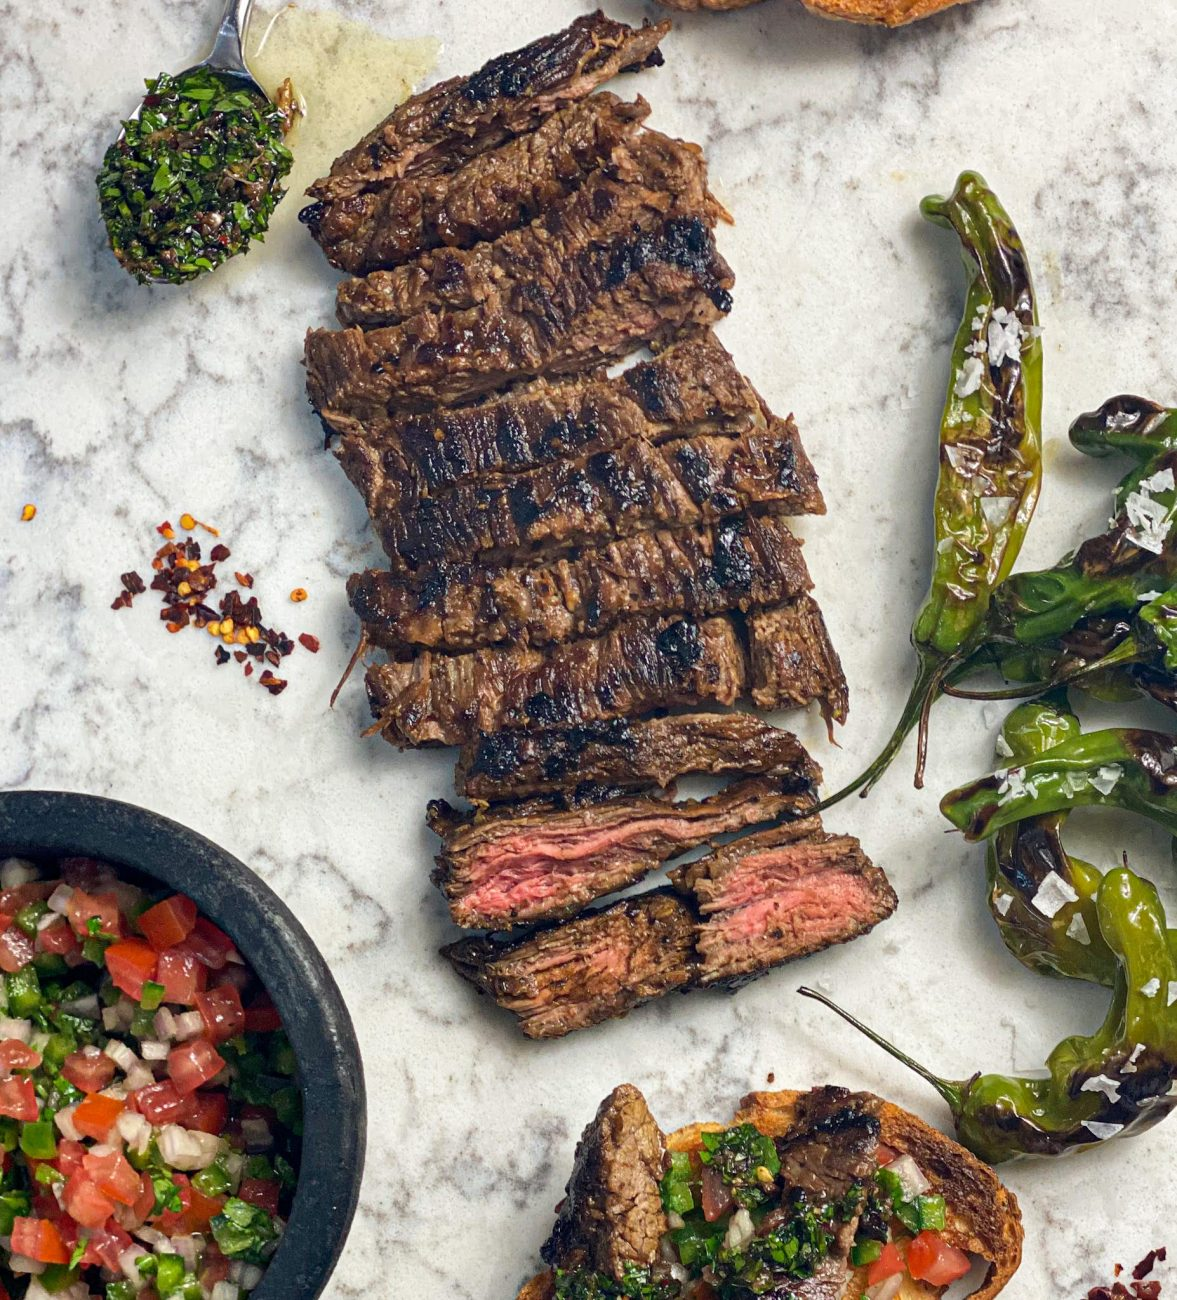 Seared Skirt Steak With Chimichurri Sauce